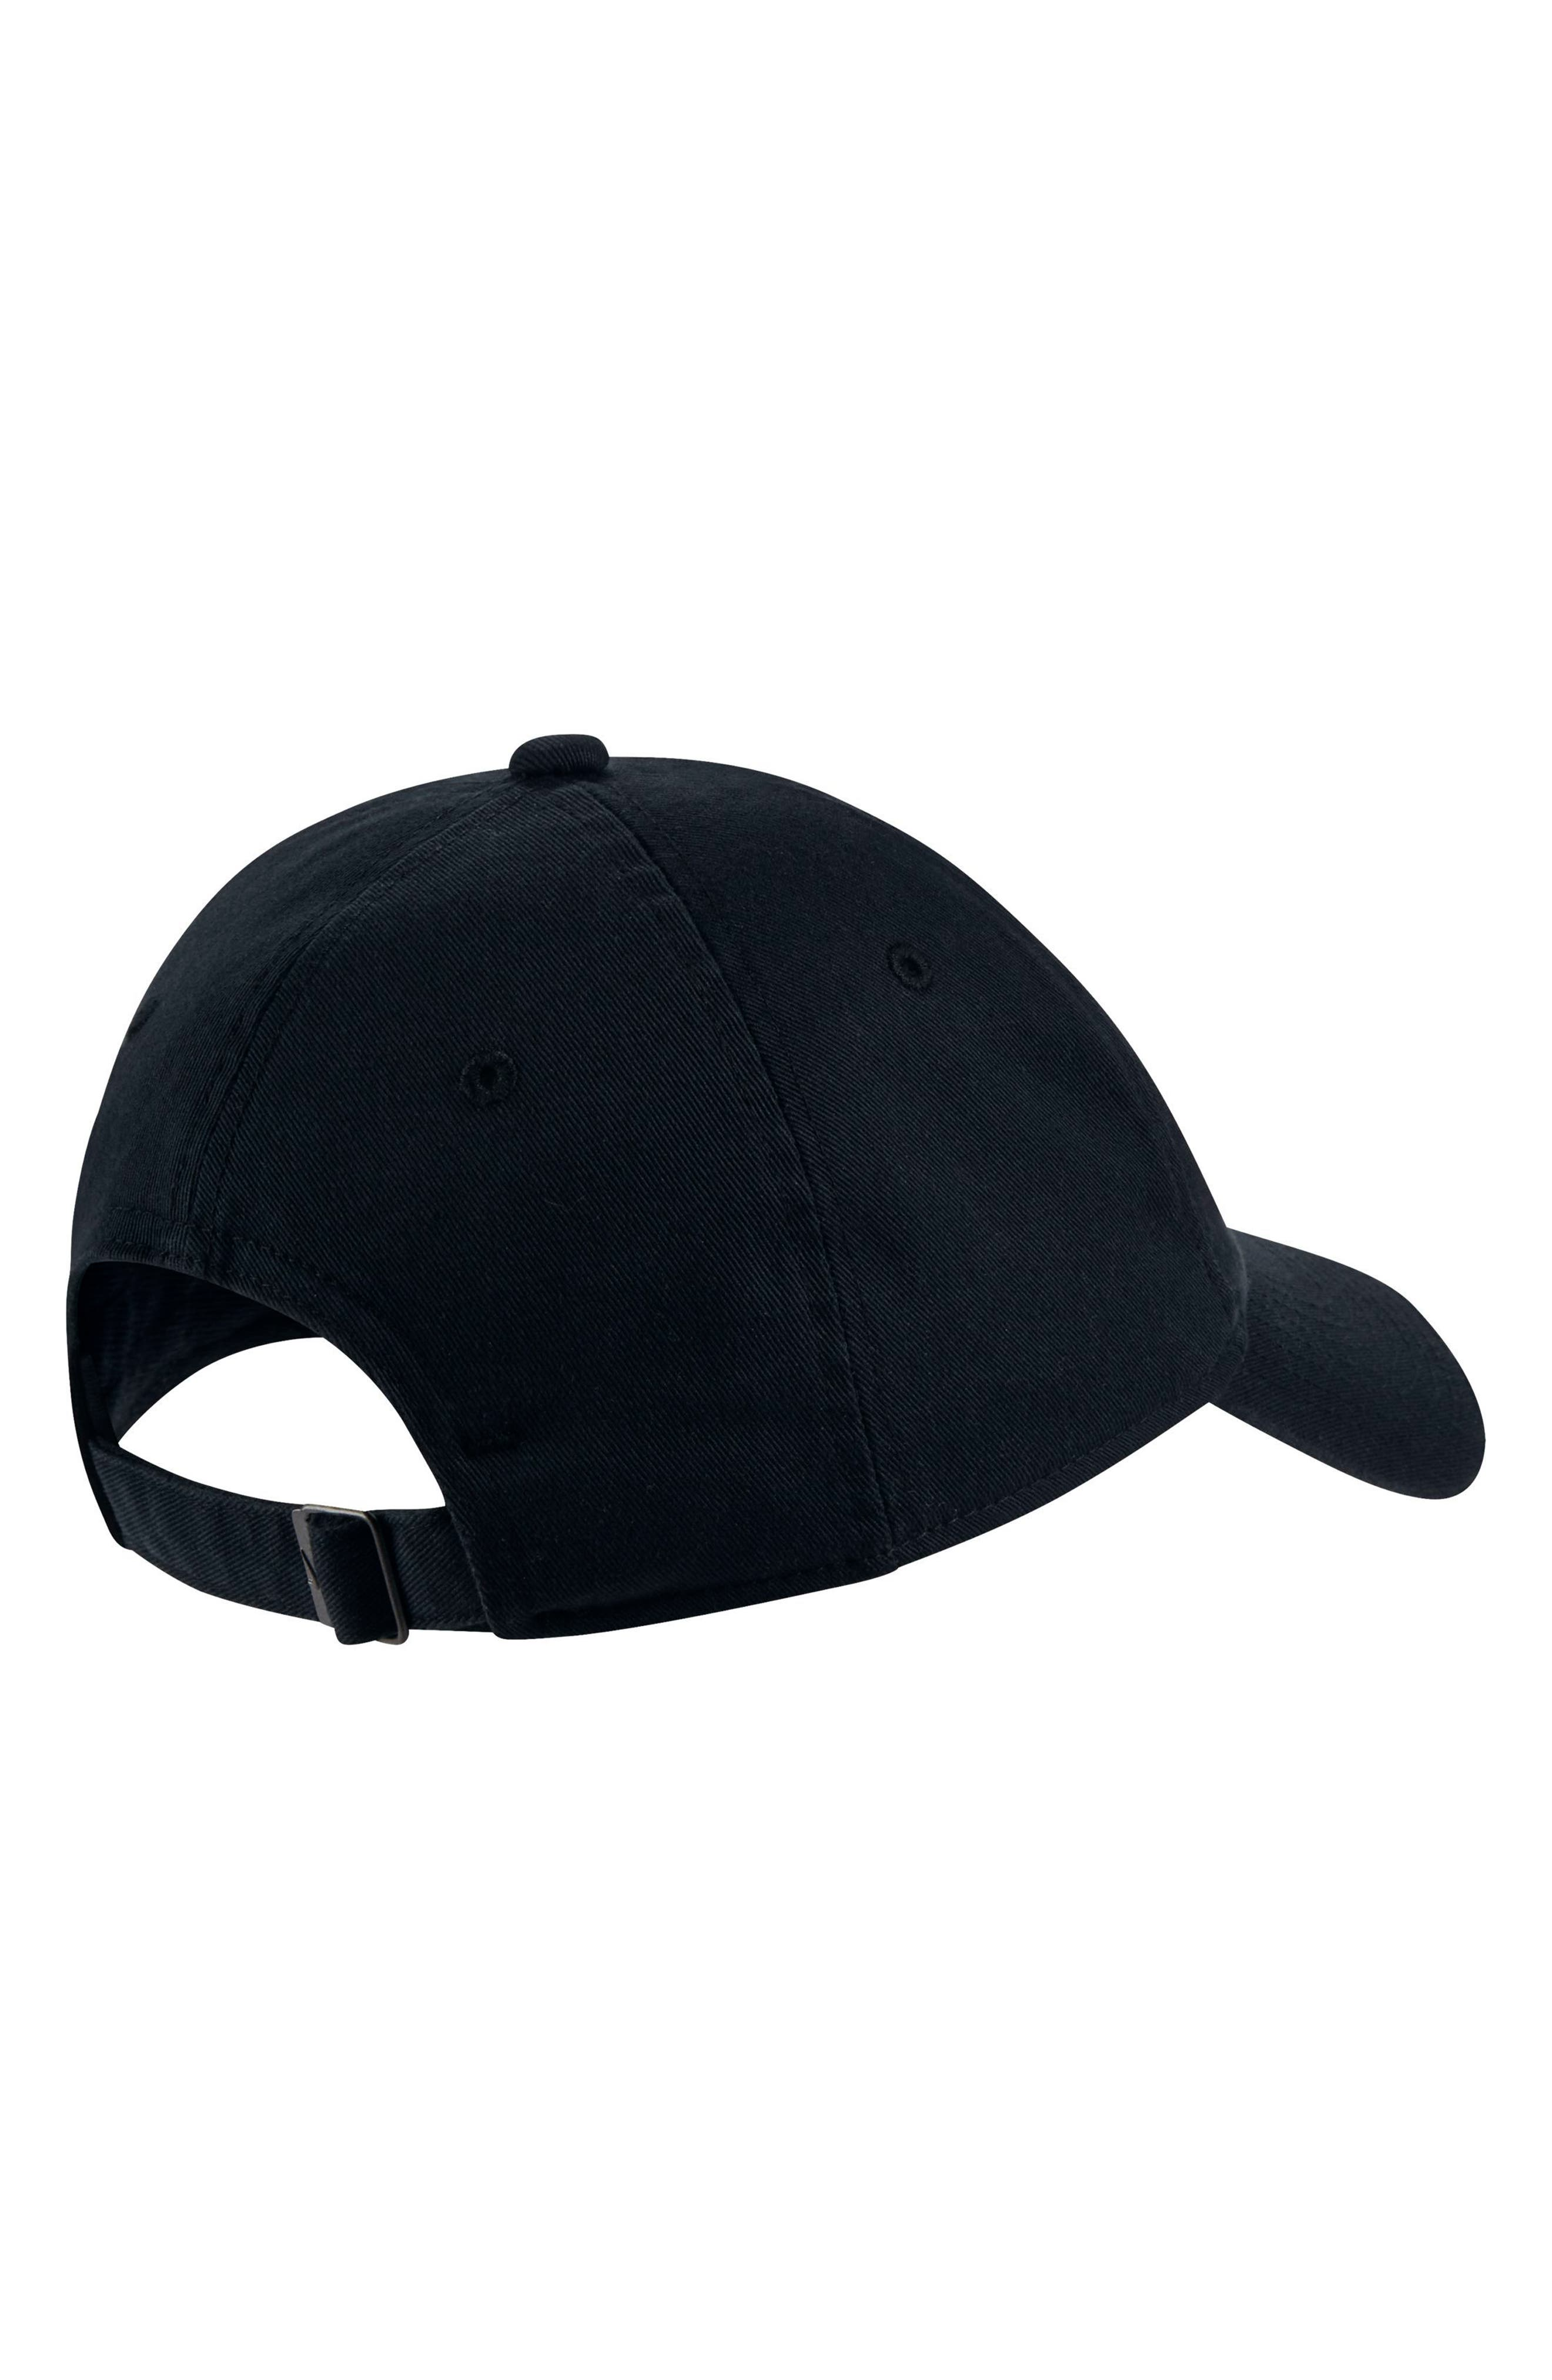 Women's H86 Swoosh Hat,                             Alternate thumbnail 2, color,                             Black/ White